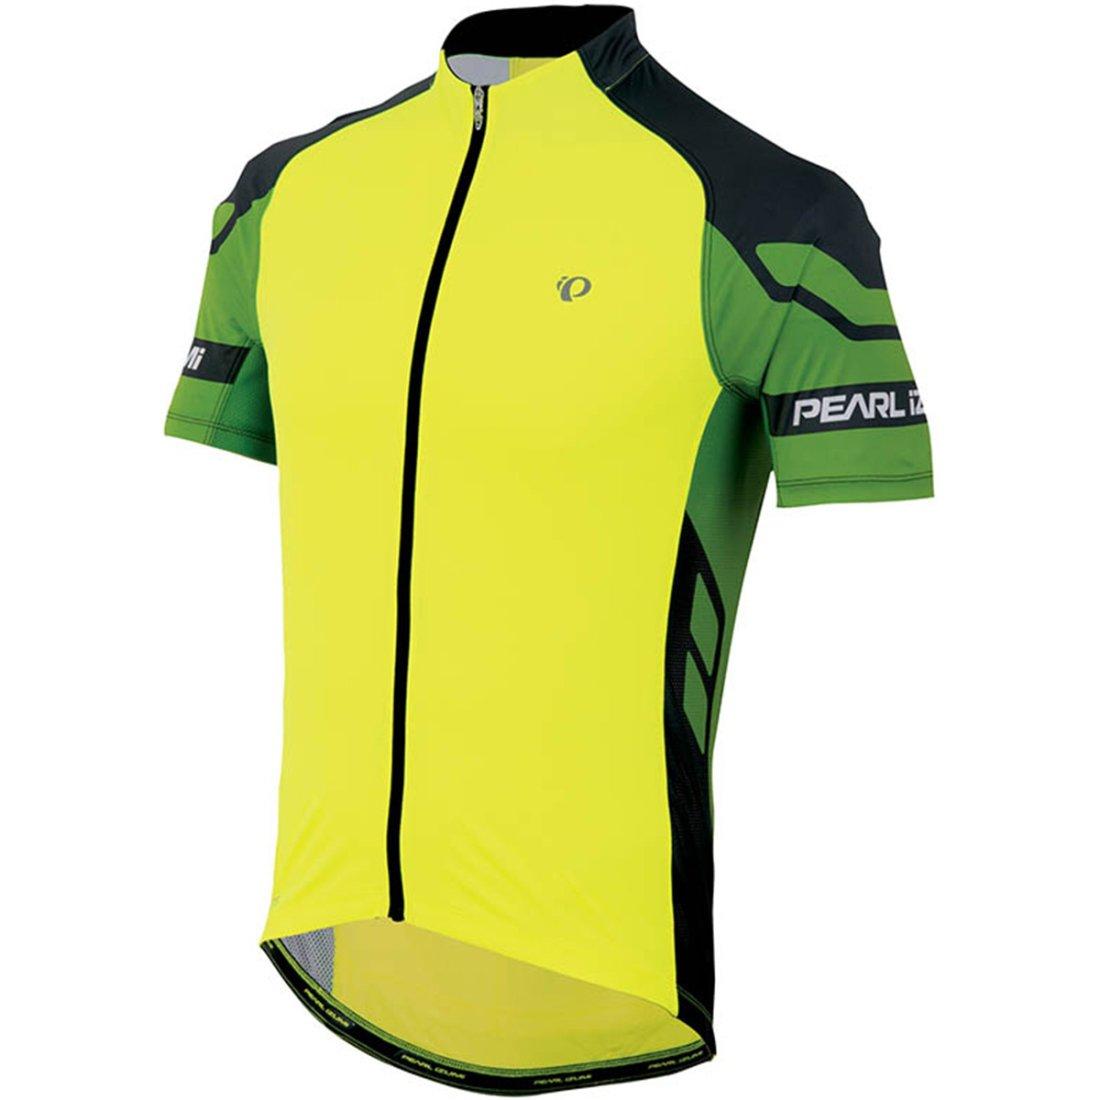 Pearl izumi elite yellow green jersey motocard for Pearl izumi cycling shirt